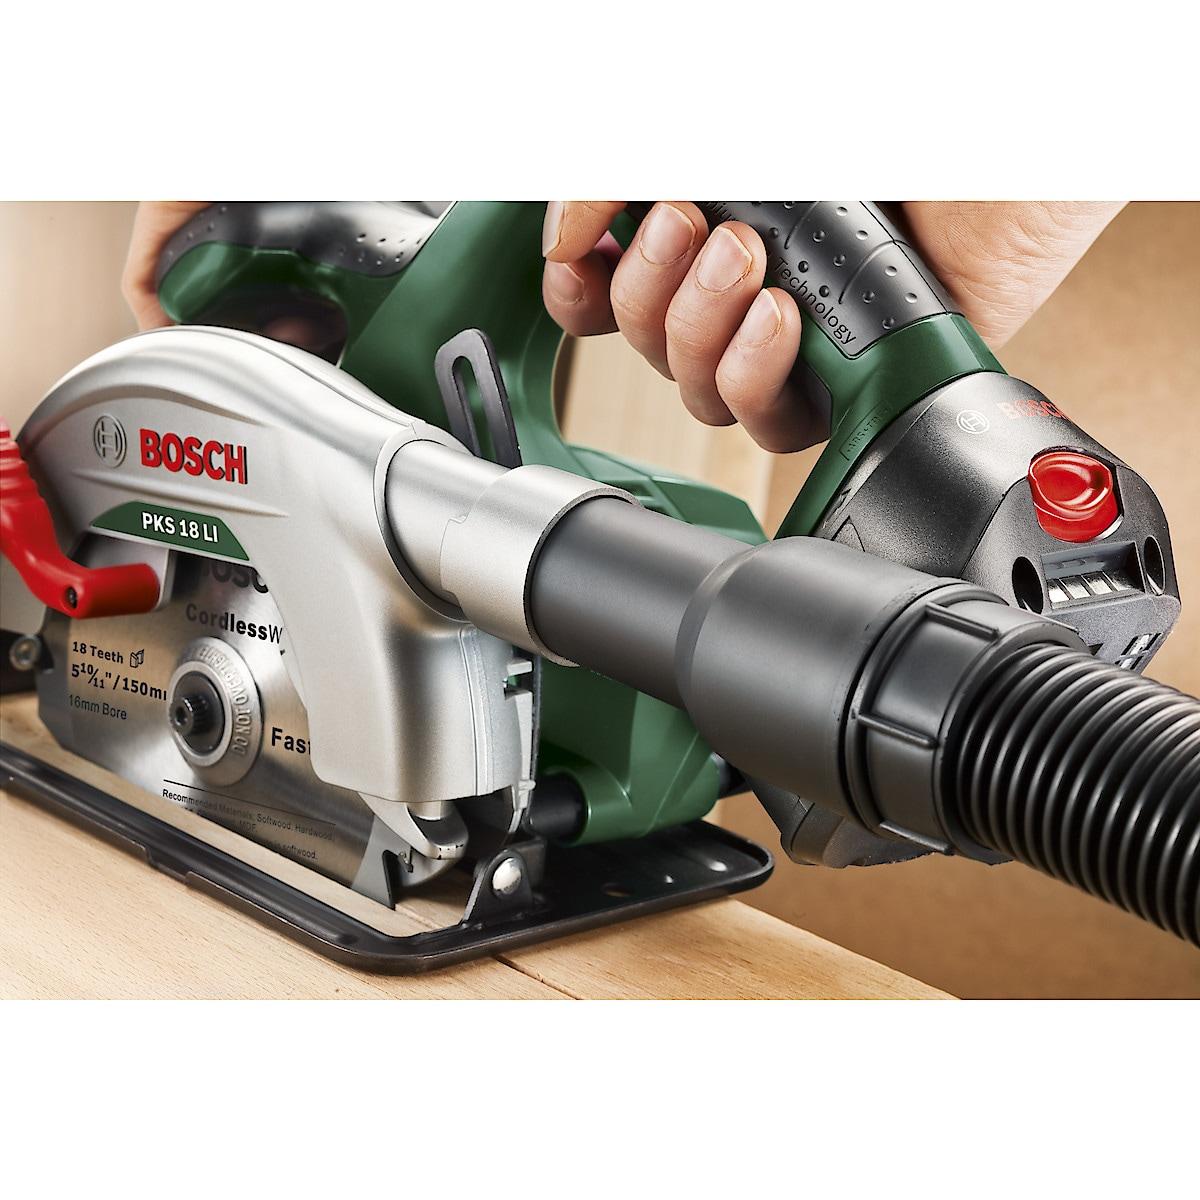 Bosch PKS 18 LI sirkelsag